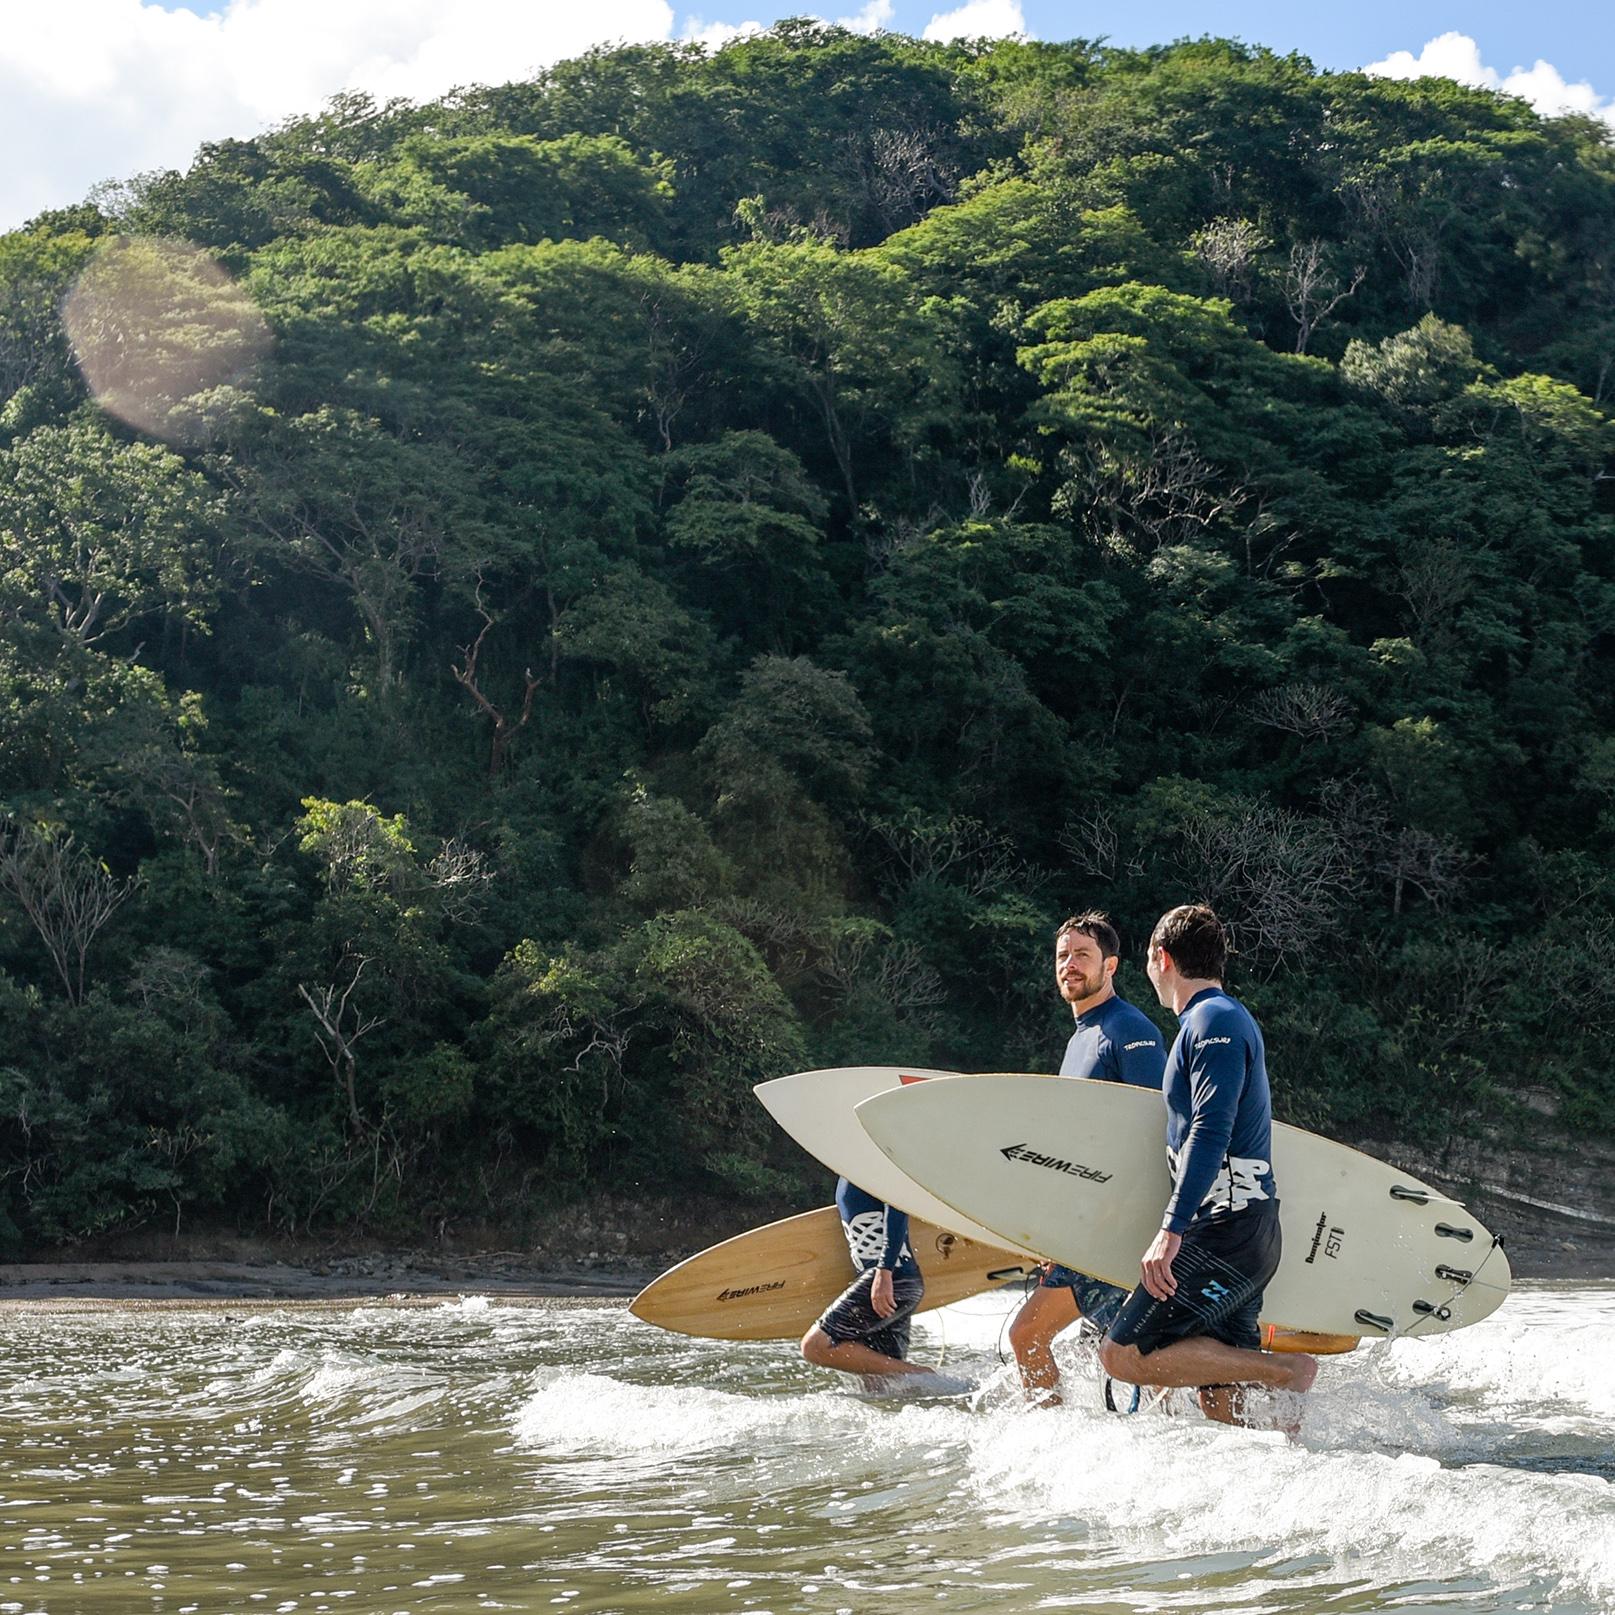 Mukul-Surf-Nicaragua-4.jpg